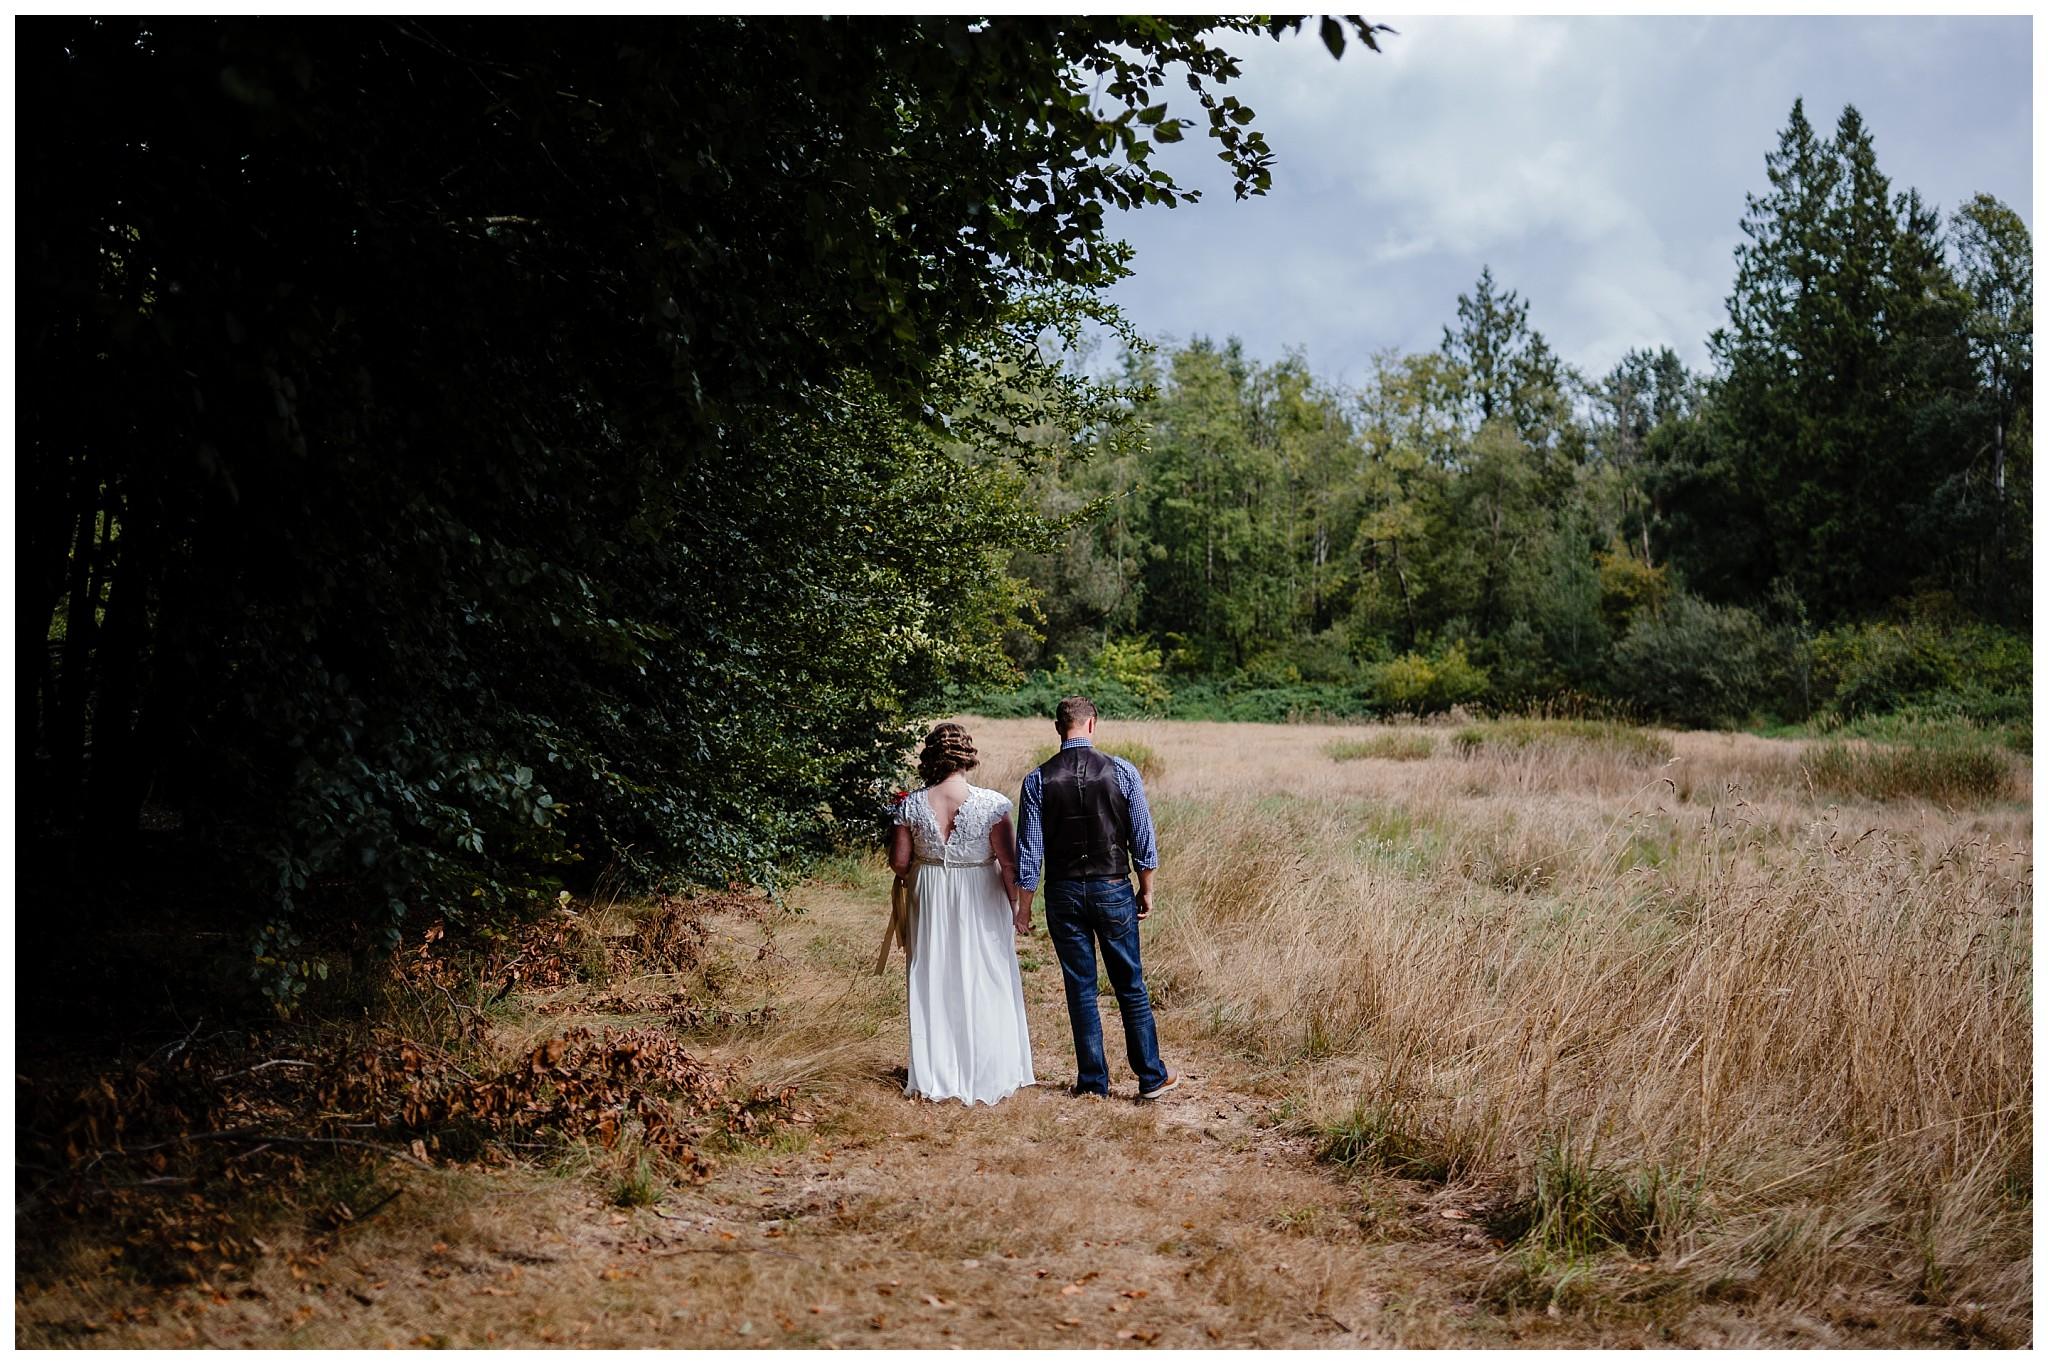 Aldergrove Park Fall Backyard Wedding Photographer Pregnant Bride Tent Outdoor BC Canada Best Wedding Photographer_0029.jpg